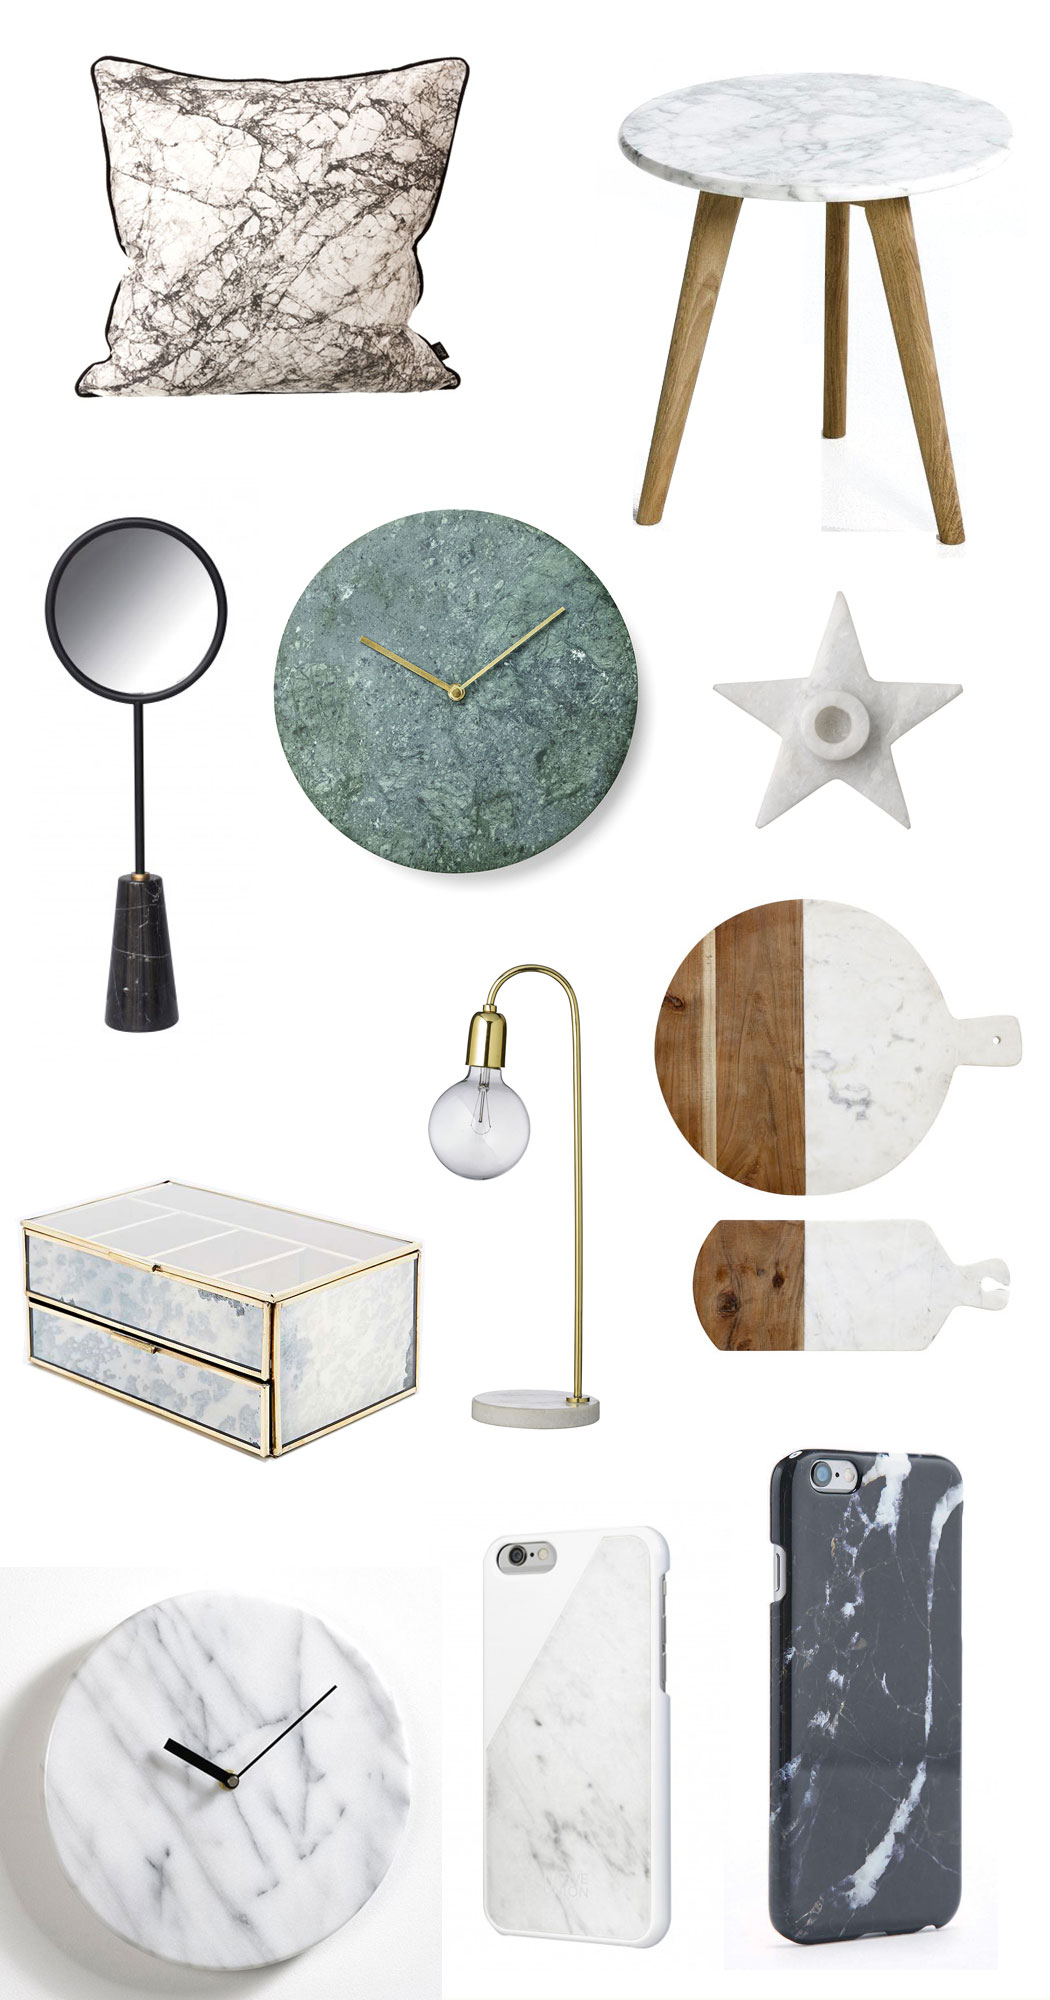 objets-déco-table-basse-coque-iphone-marbre